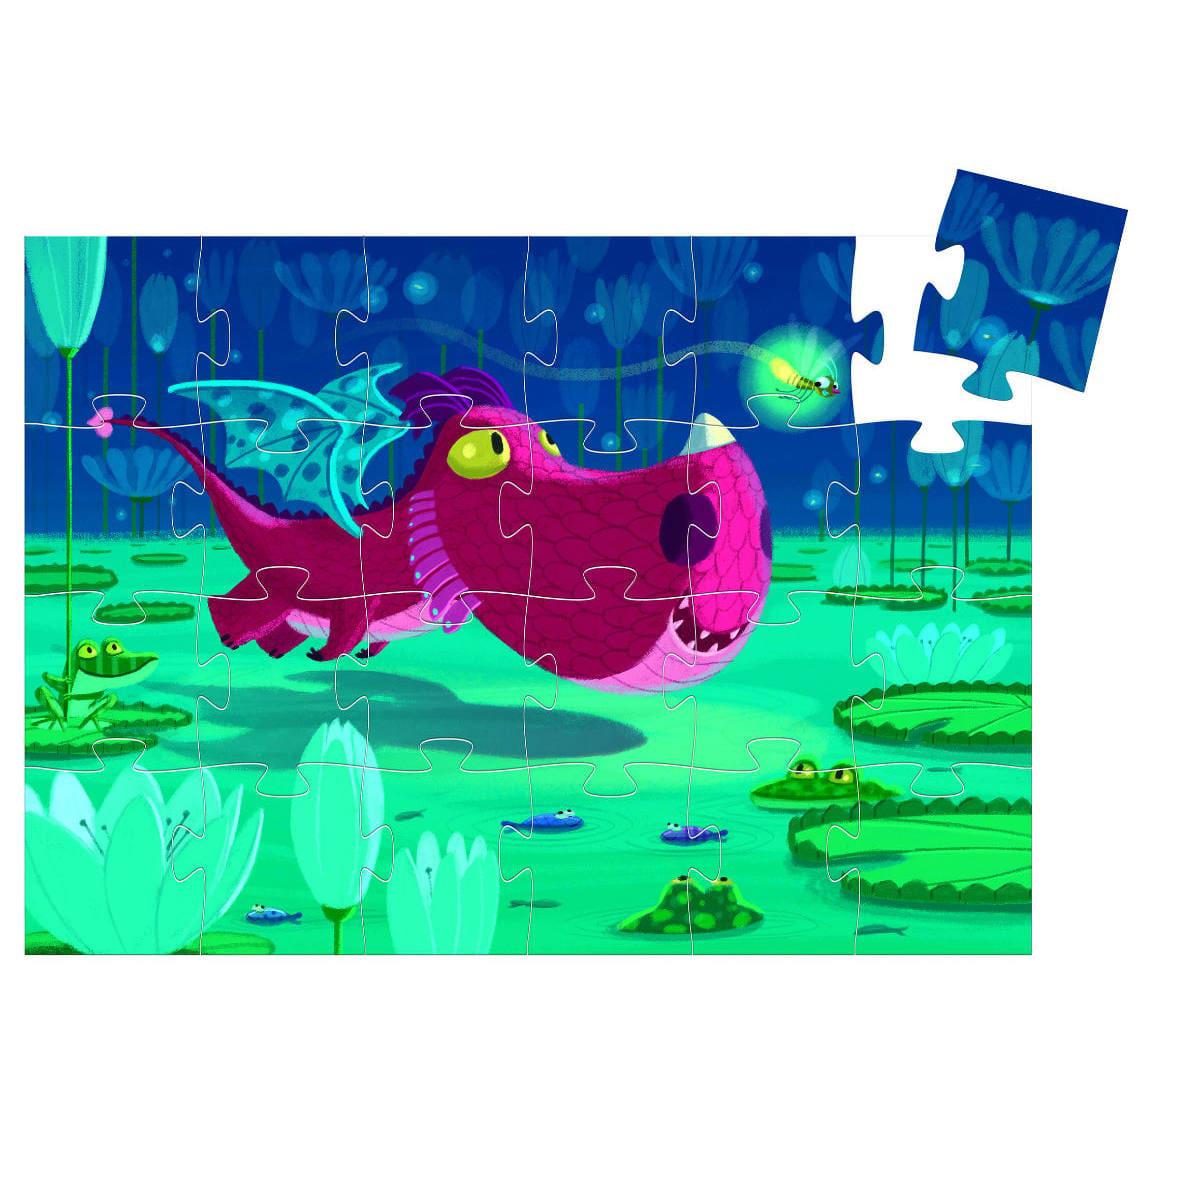 Edmond The Dragon 24 piece puzzle 2